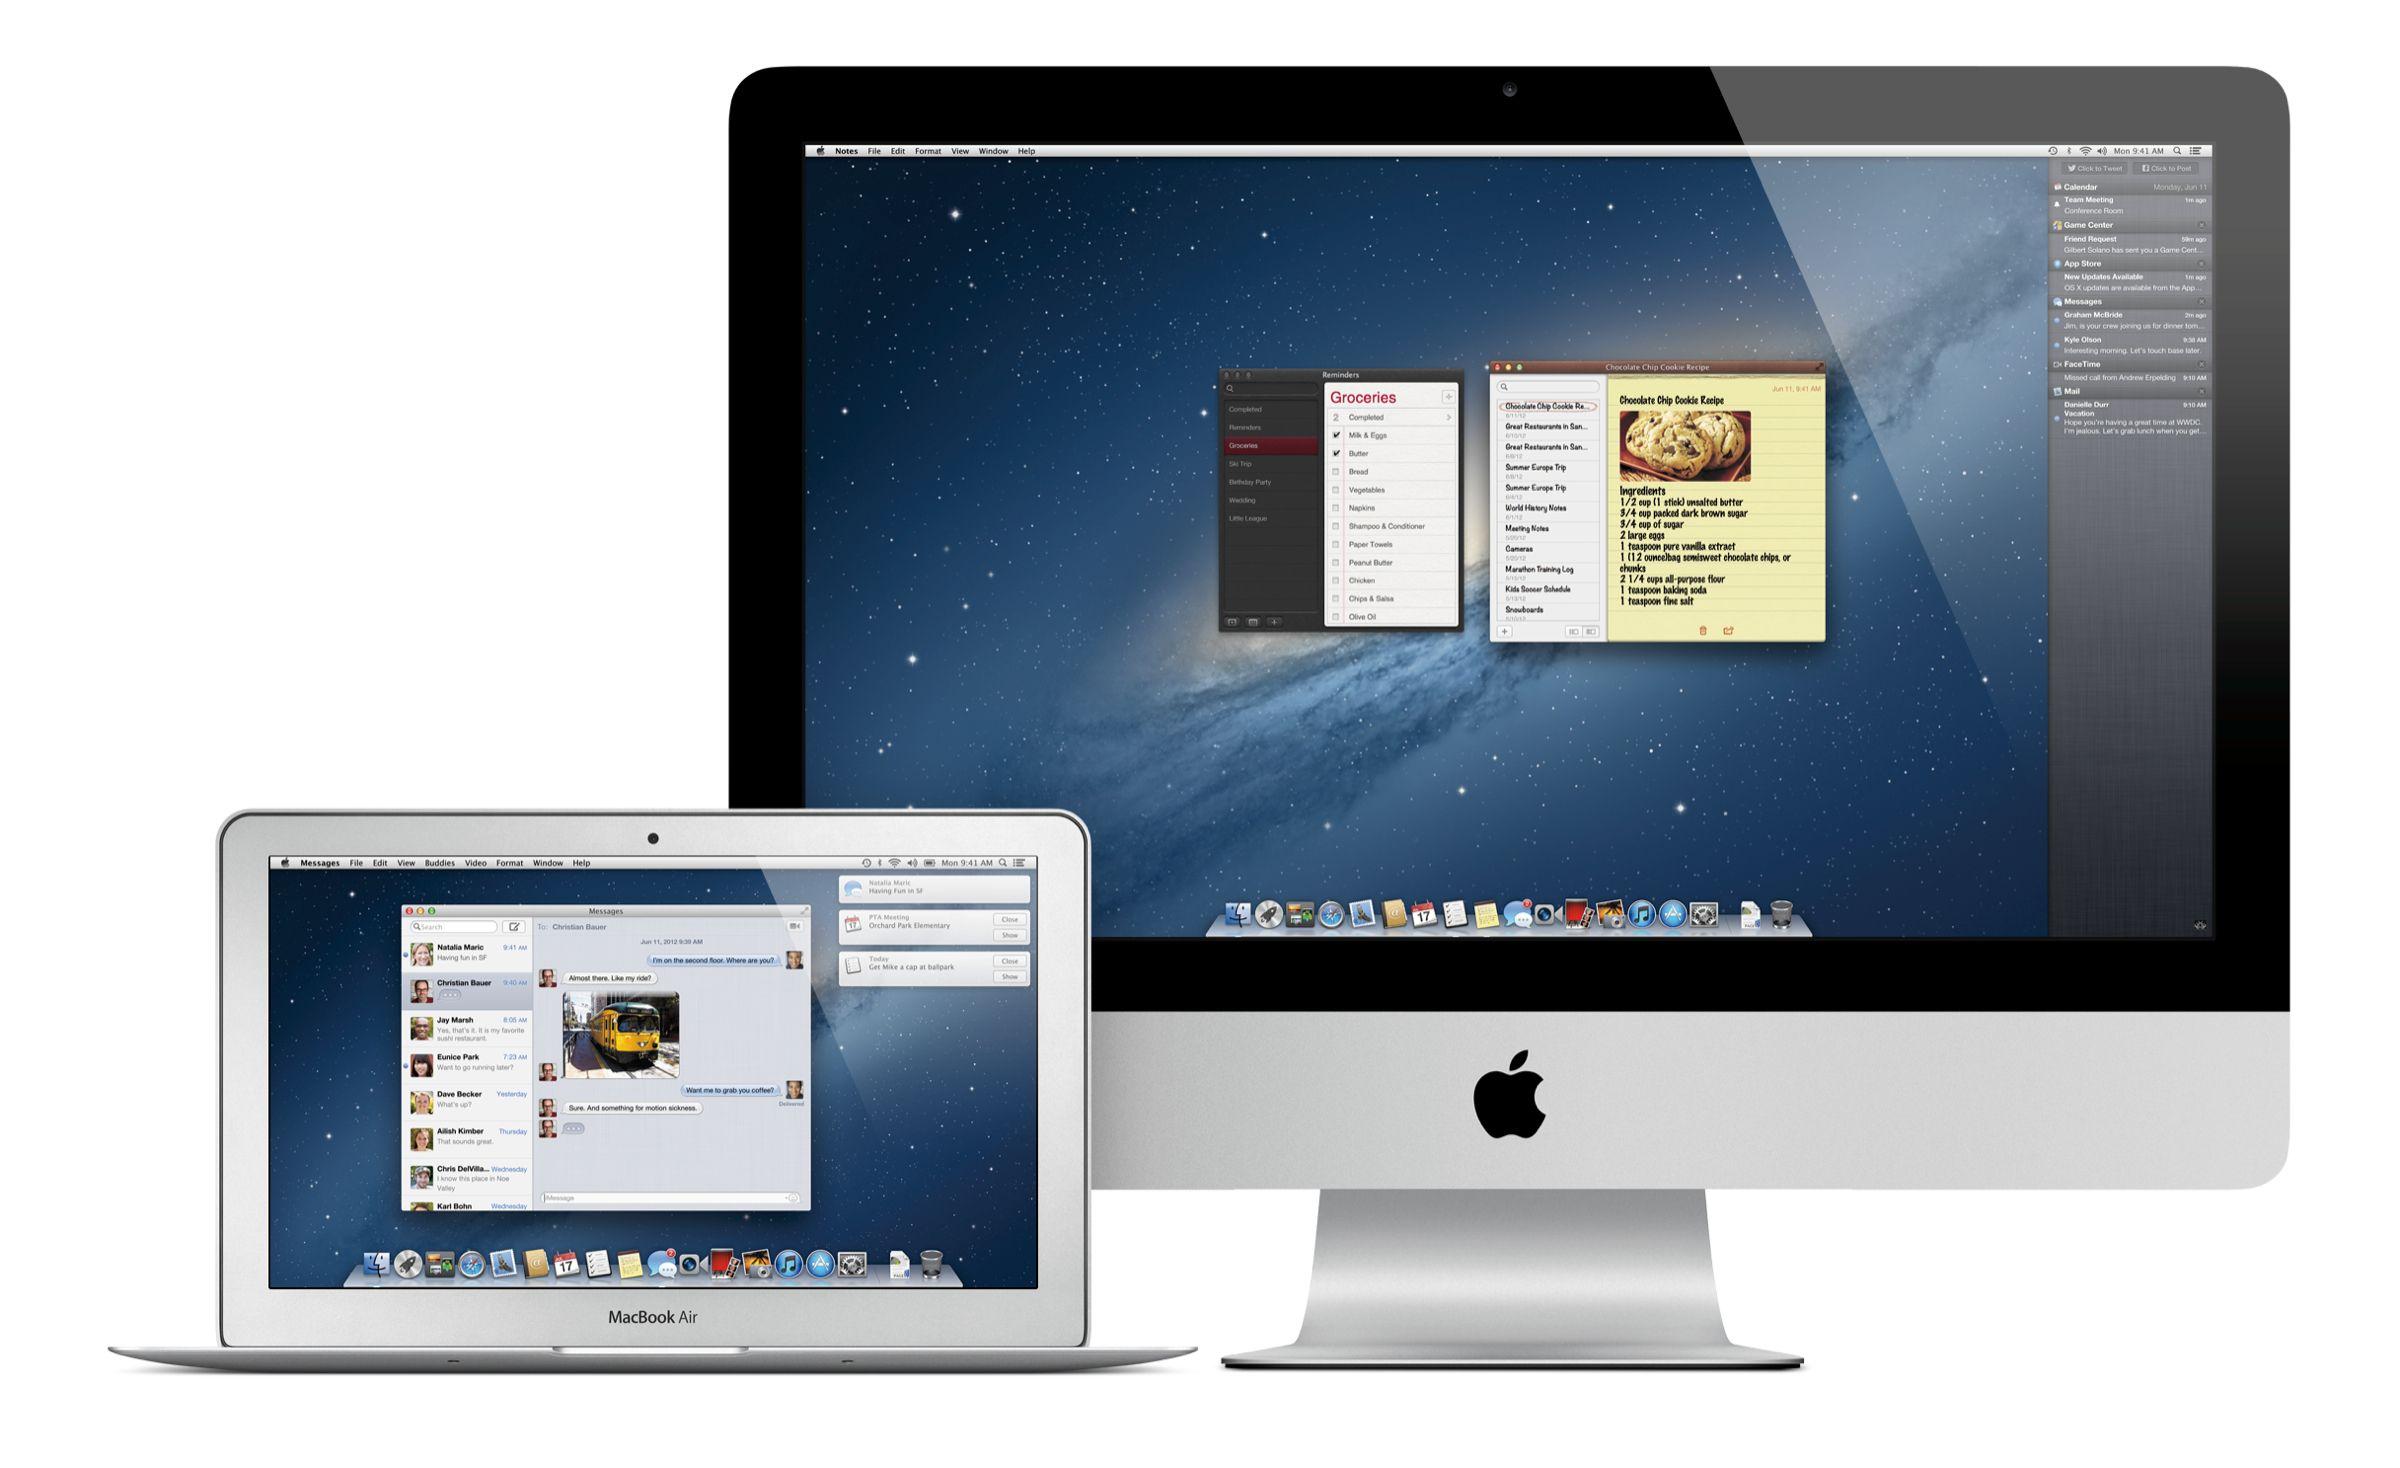 https://www.macfreak.nl/modules/news/images/zArt.iMacEnMacBookAirMountainLion.jpg